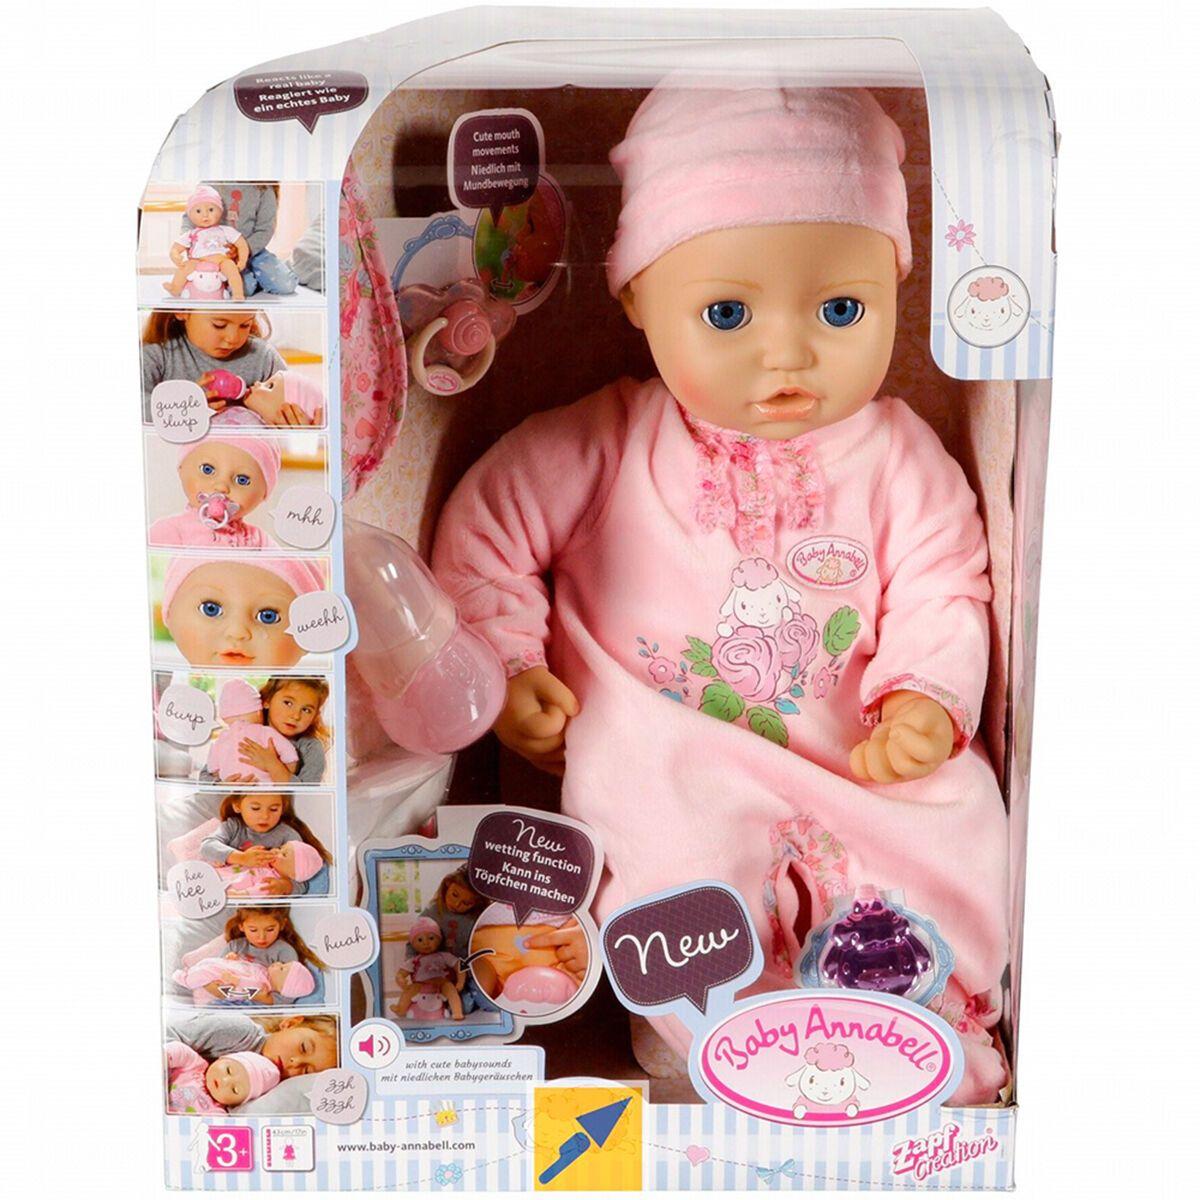 Baby Annabell oder Alexander bei Trend's Center Mattersburg